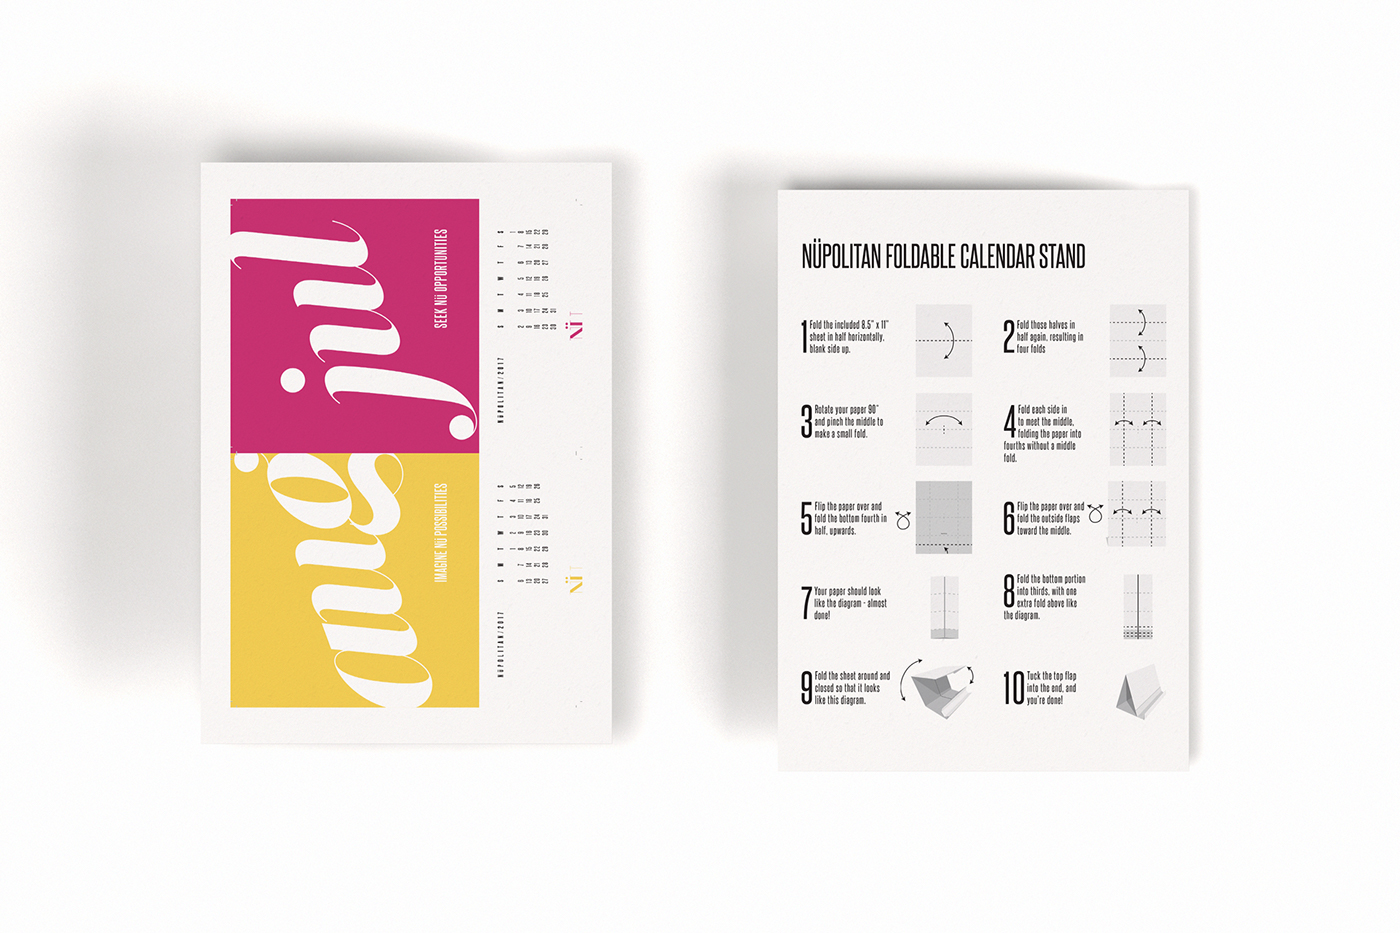 calendar download design nupolitan